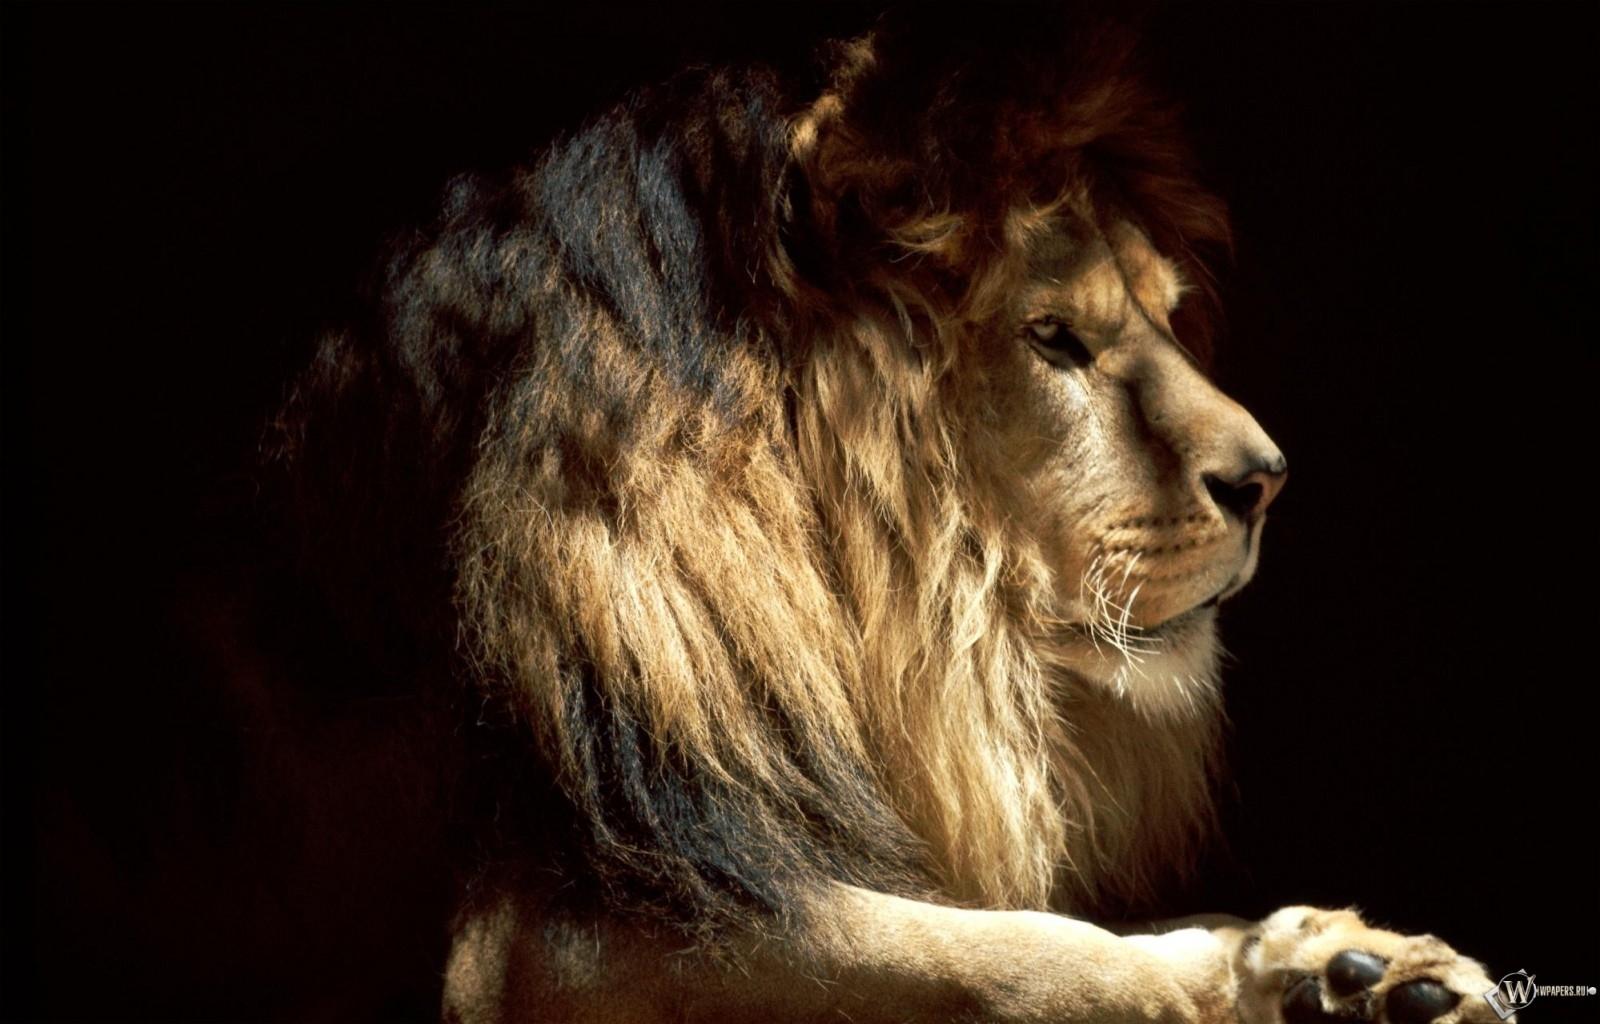 Профиль Льва 1600x1024